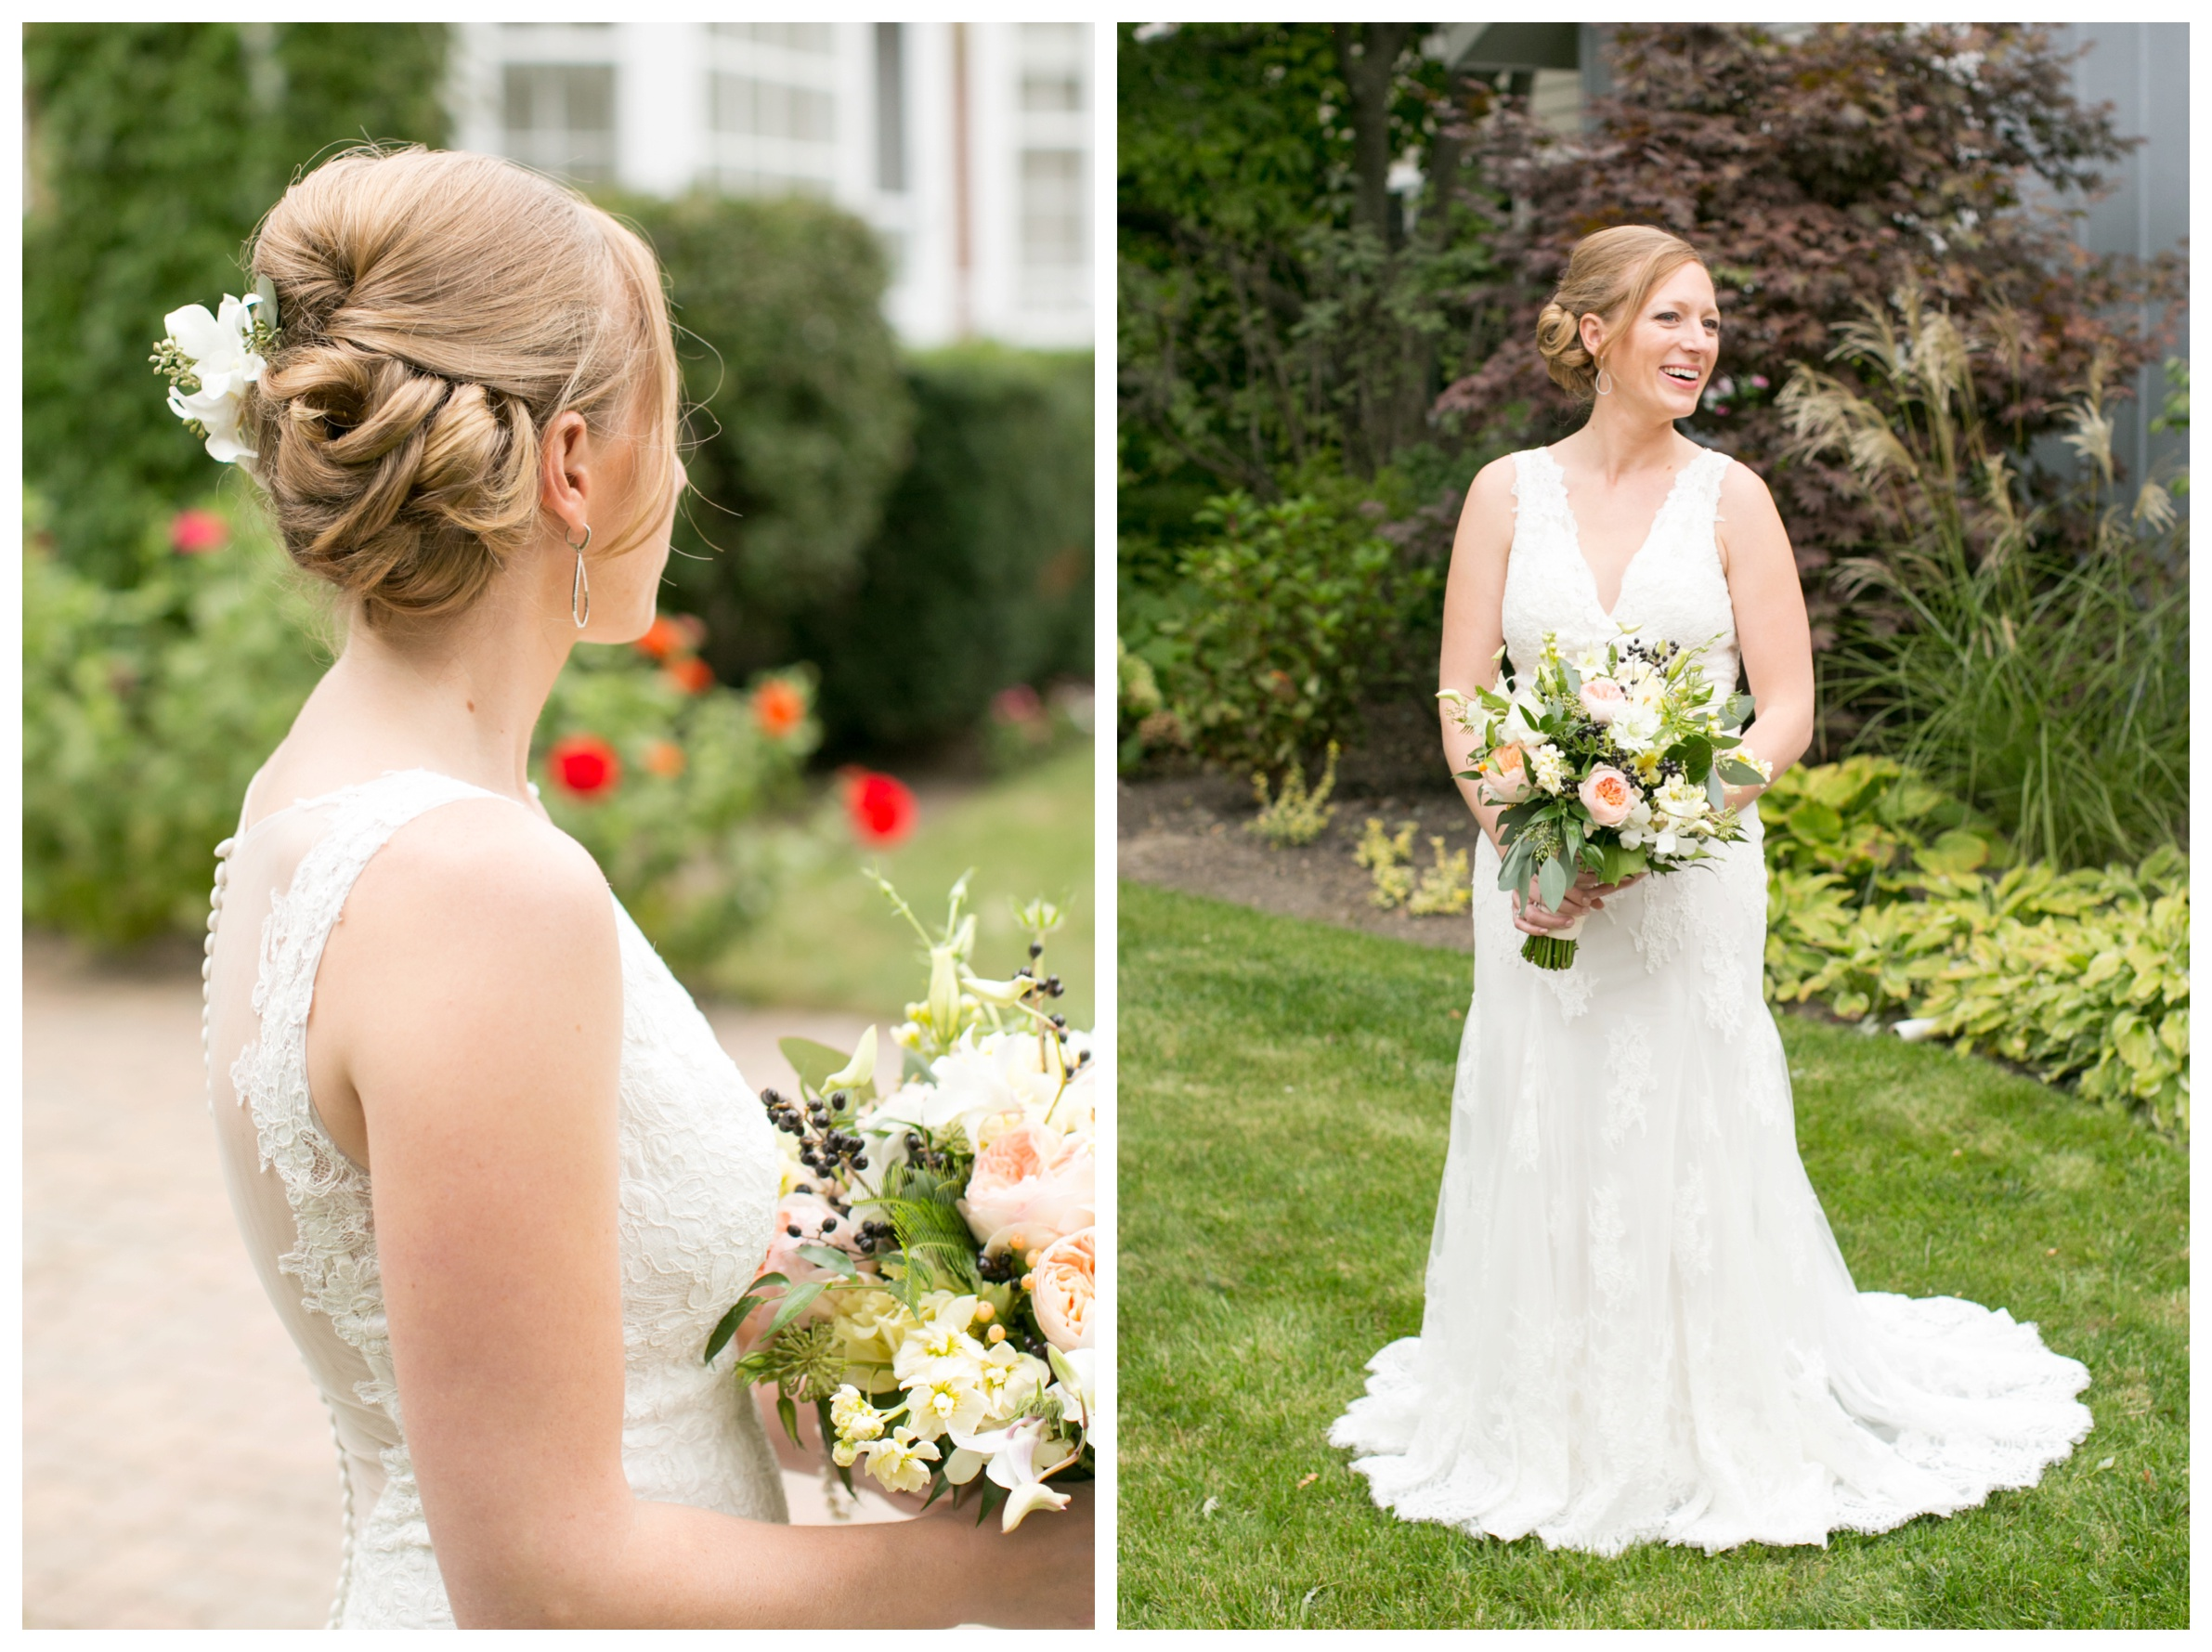 evanston-wedding-photographer